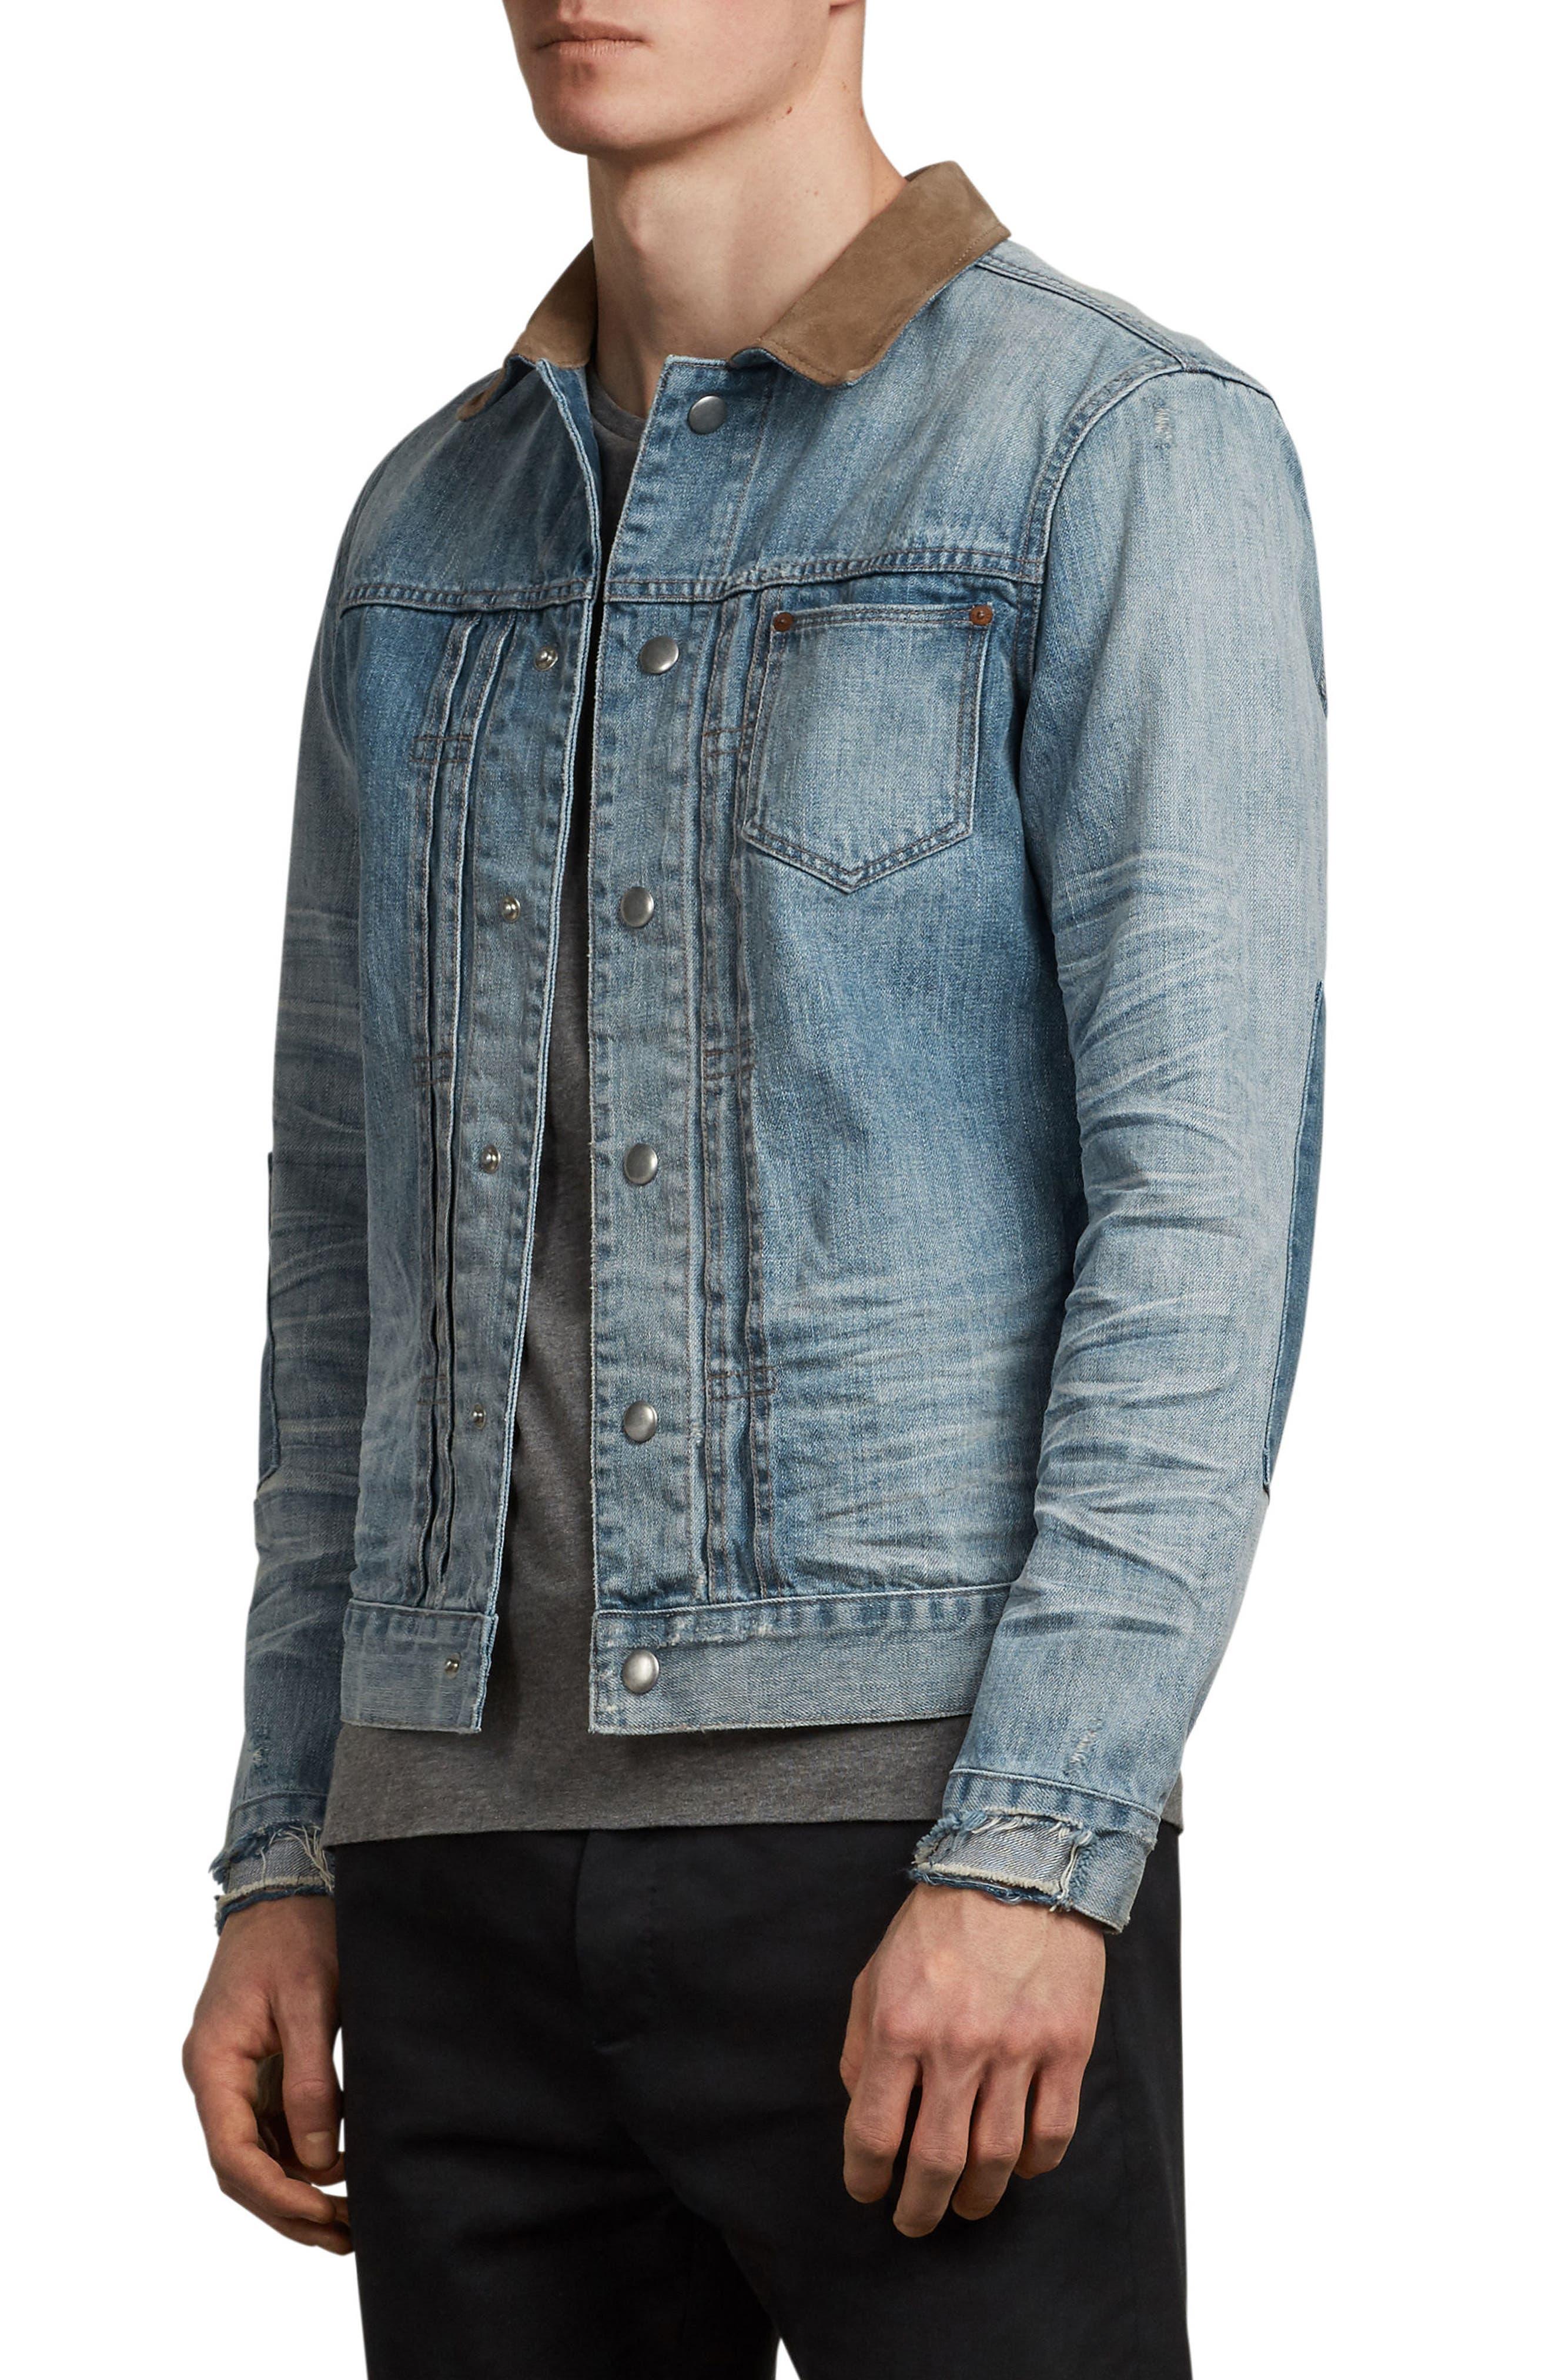 Ibanex Slim Fit Distressed Denim Jacket,                             Alternate thumbnail 3, color,                             460